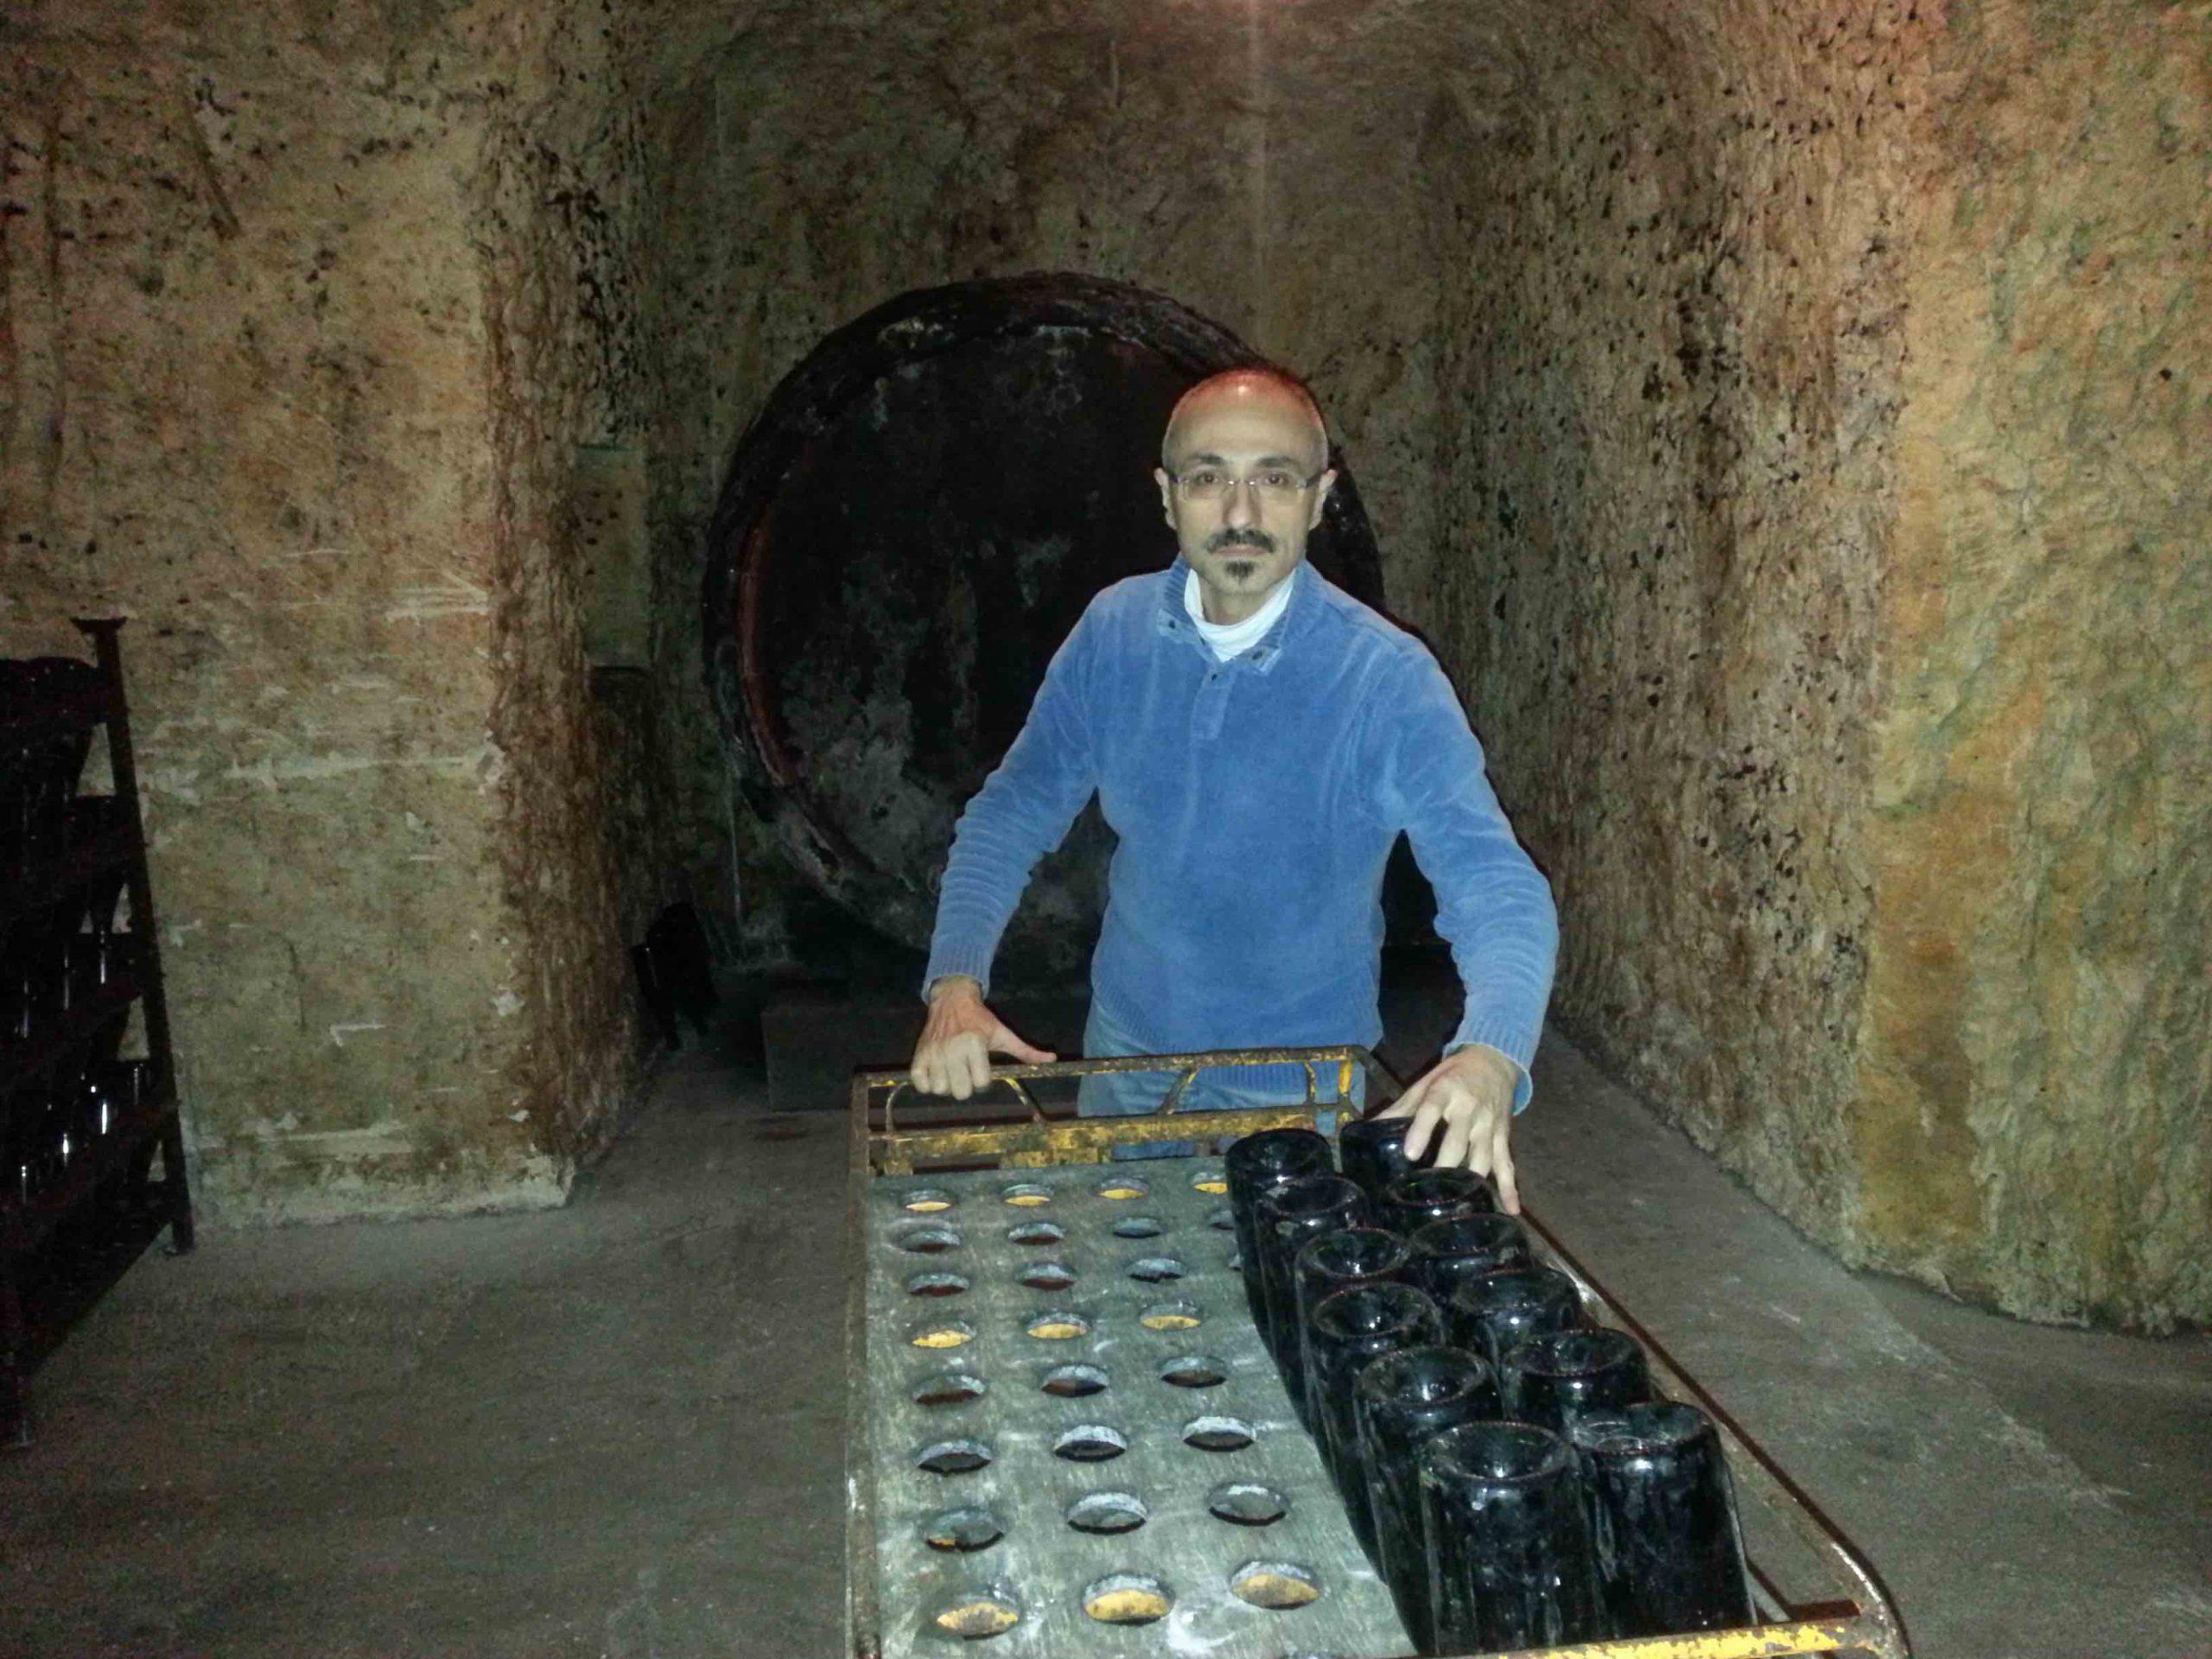 Paste Ludovic, Le Bois Joli, Epernay, Champagne